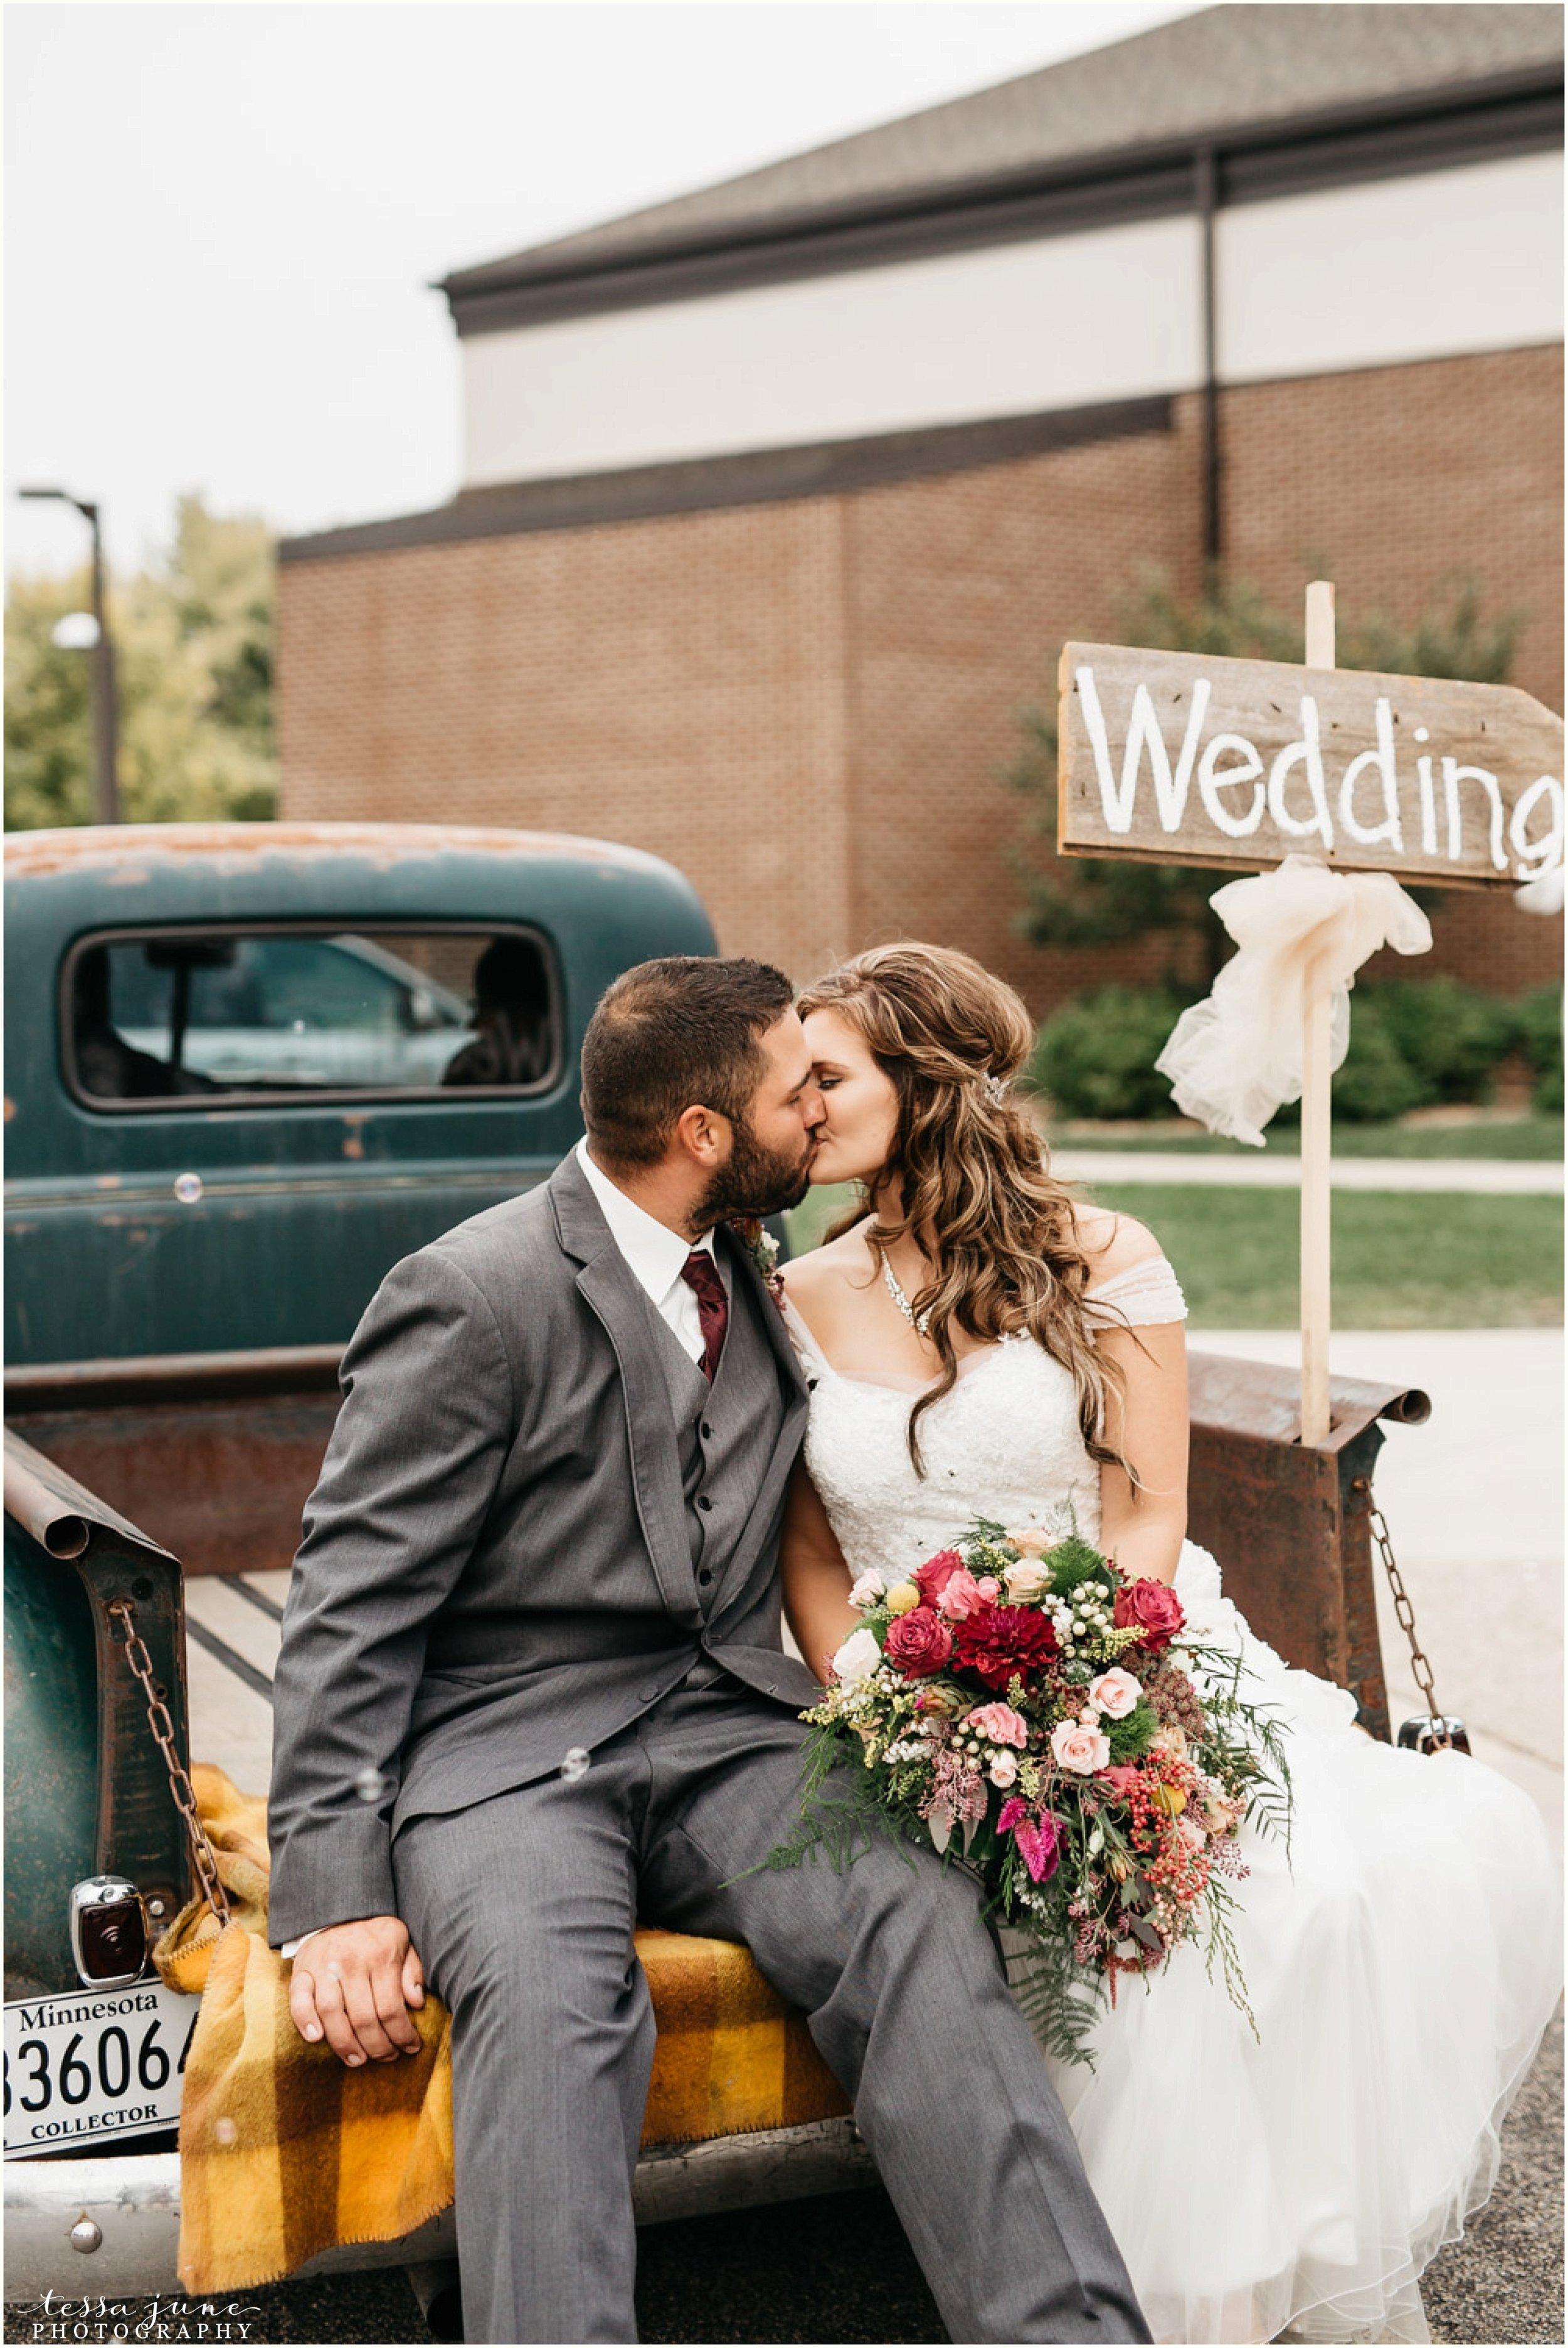 bohemian-minnesota-wedding-mismatched-bridesmaid-dresses-waterfall-st-cloud-tessa-june-photography-123.jpg